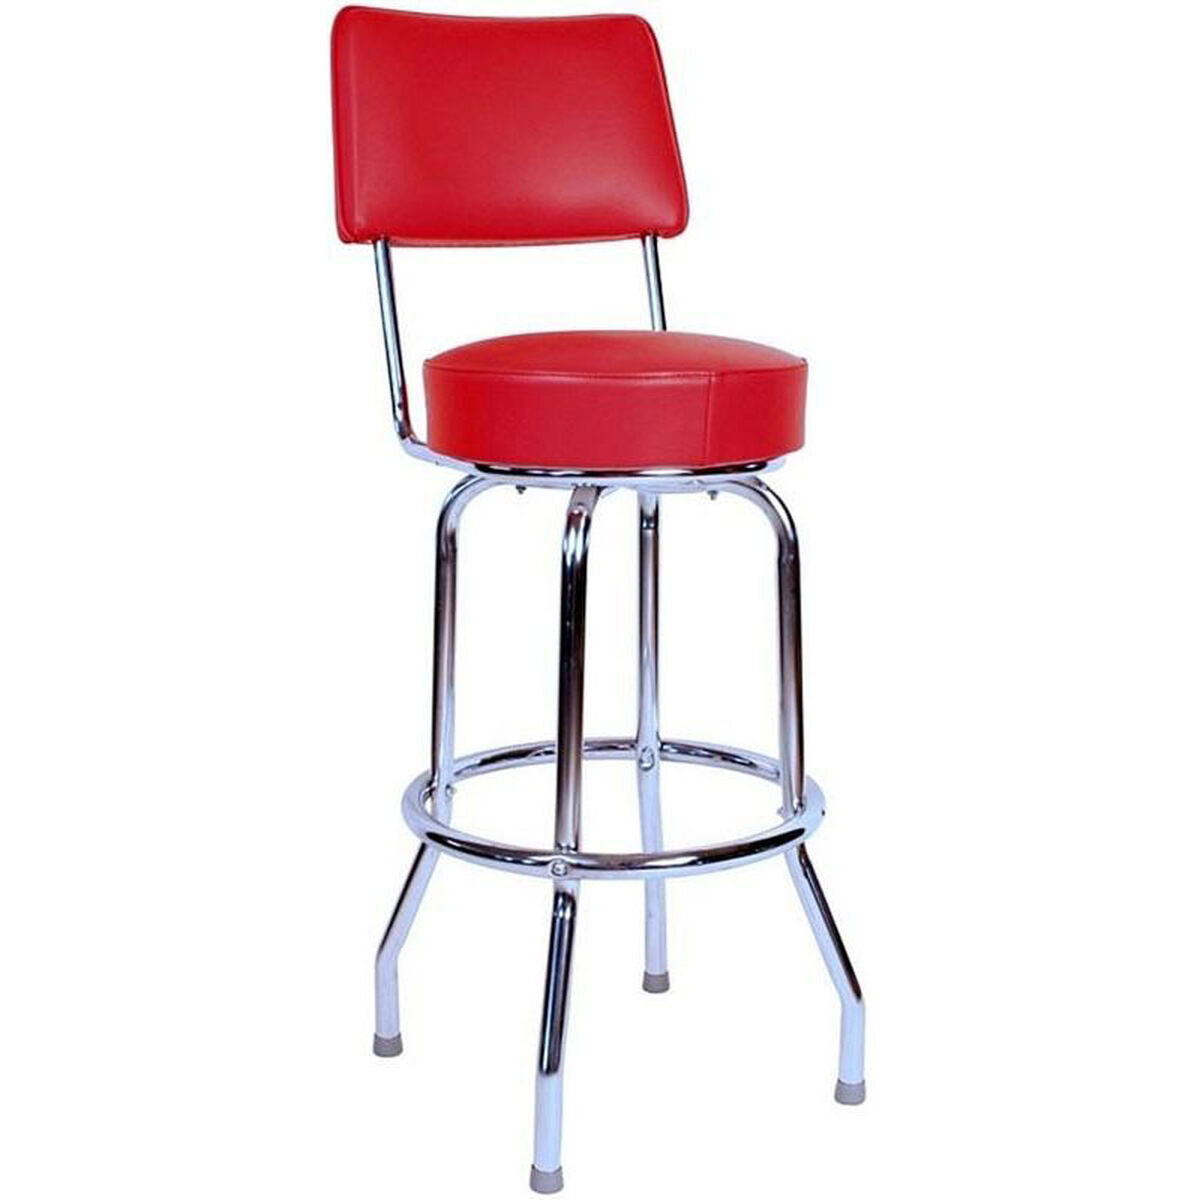 Red Vinyl Swivel Barstool 0 1957red24 Churchchairs4lesscom